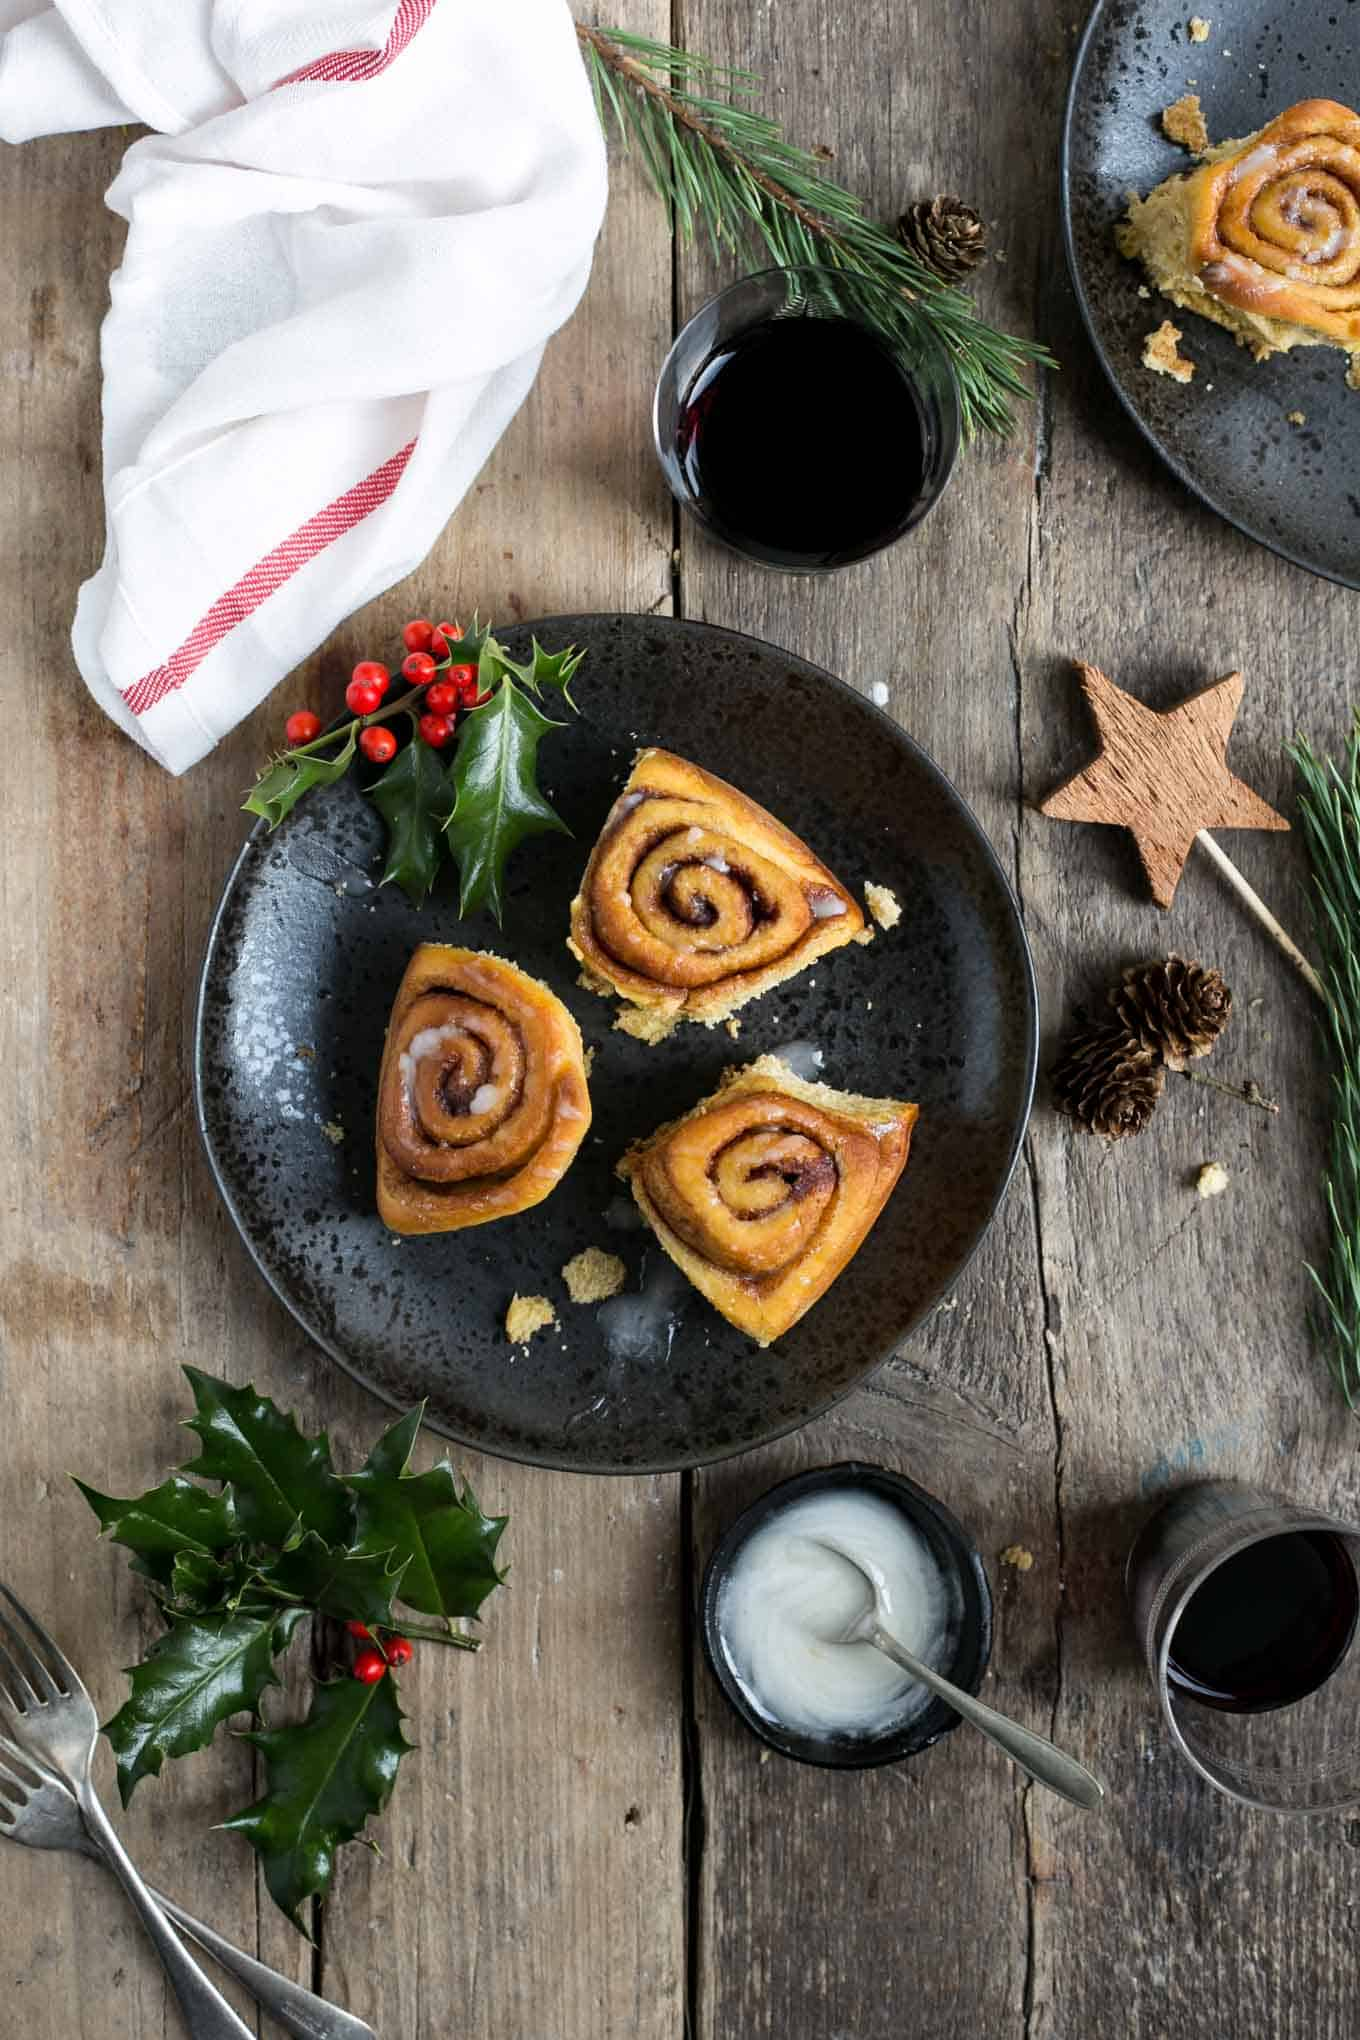 Sweet potato cinnamon rolls. These are soft, fluffy and easy to make! #vegan #cinnamonrolls #dairyfree | via @annabanana.co